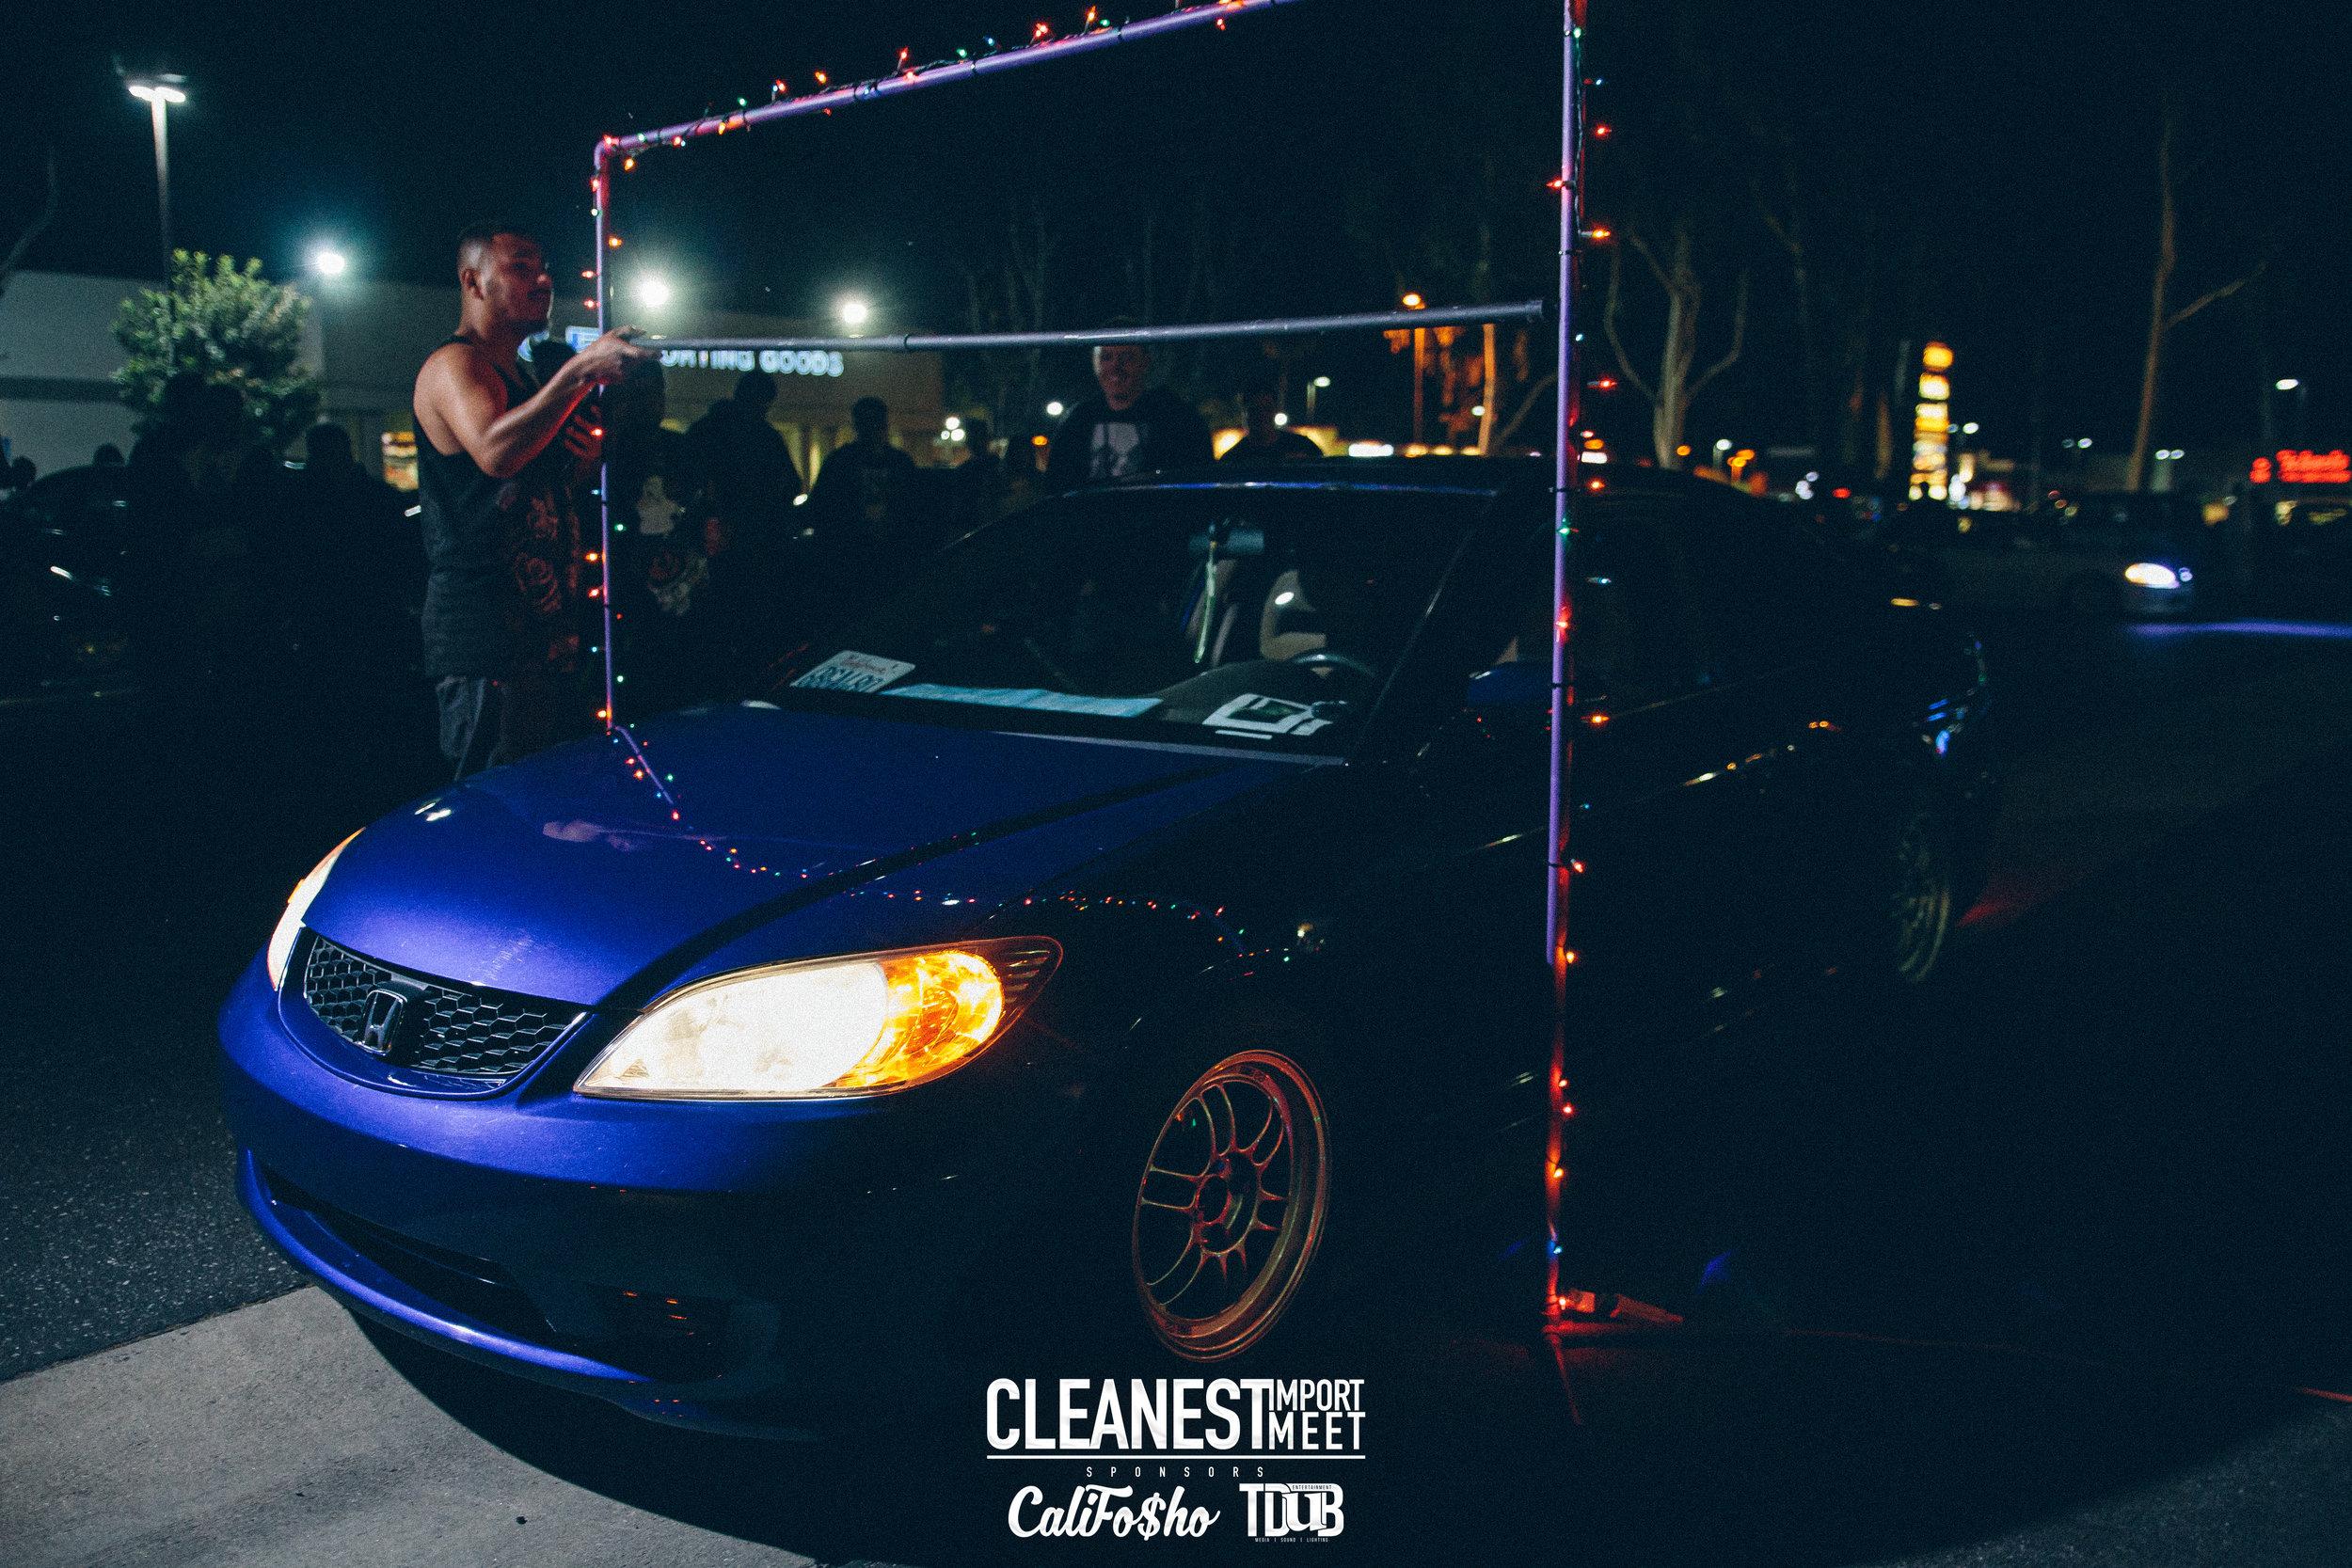 Cleanest Import Meet - Cali Fosho x TDUB Ent-0686.jpg